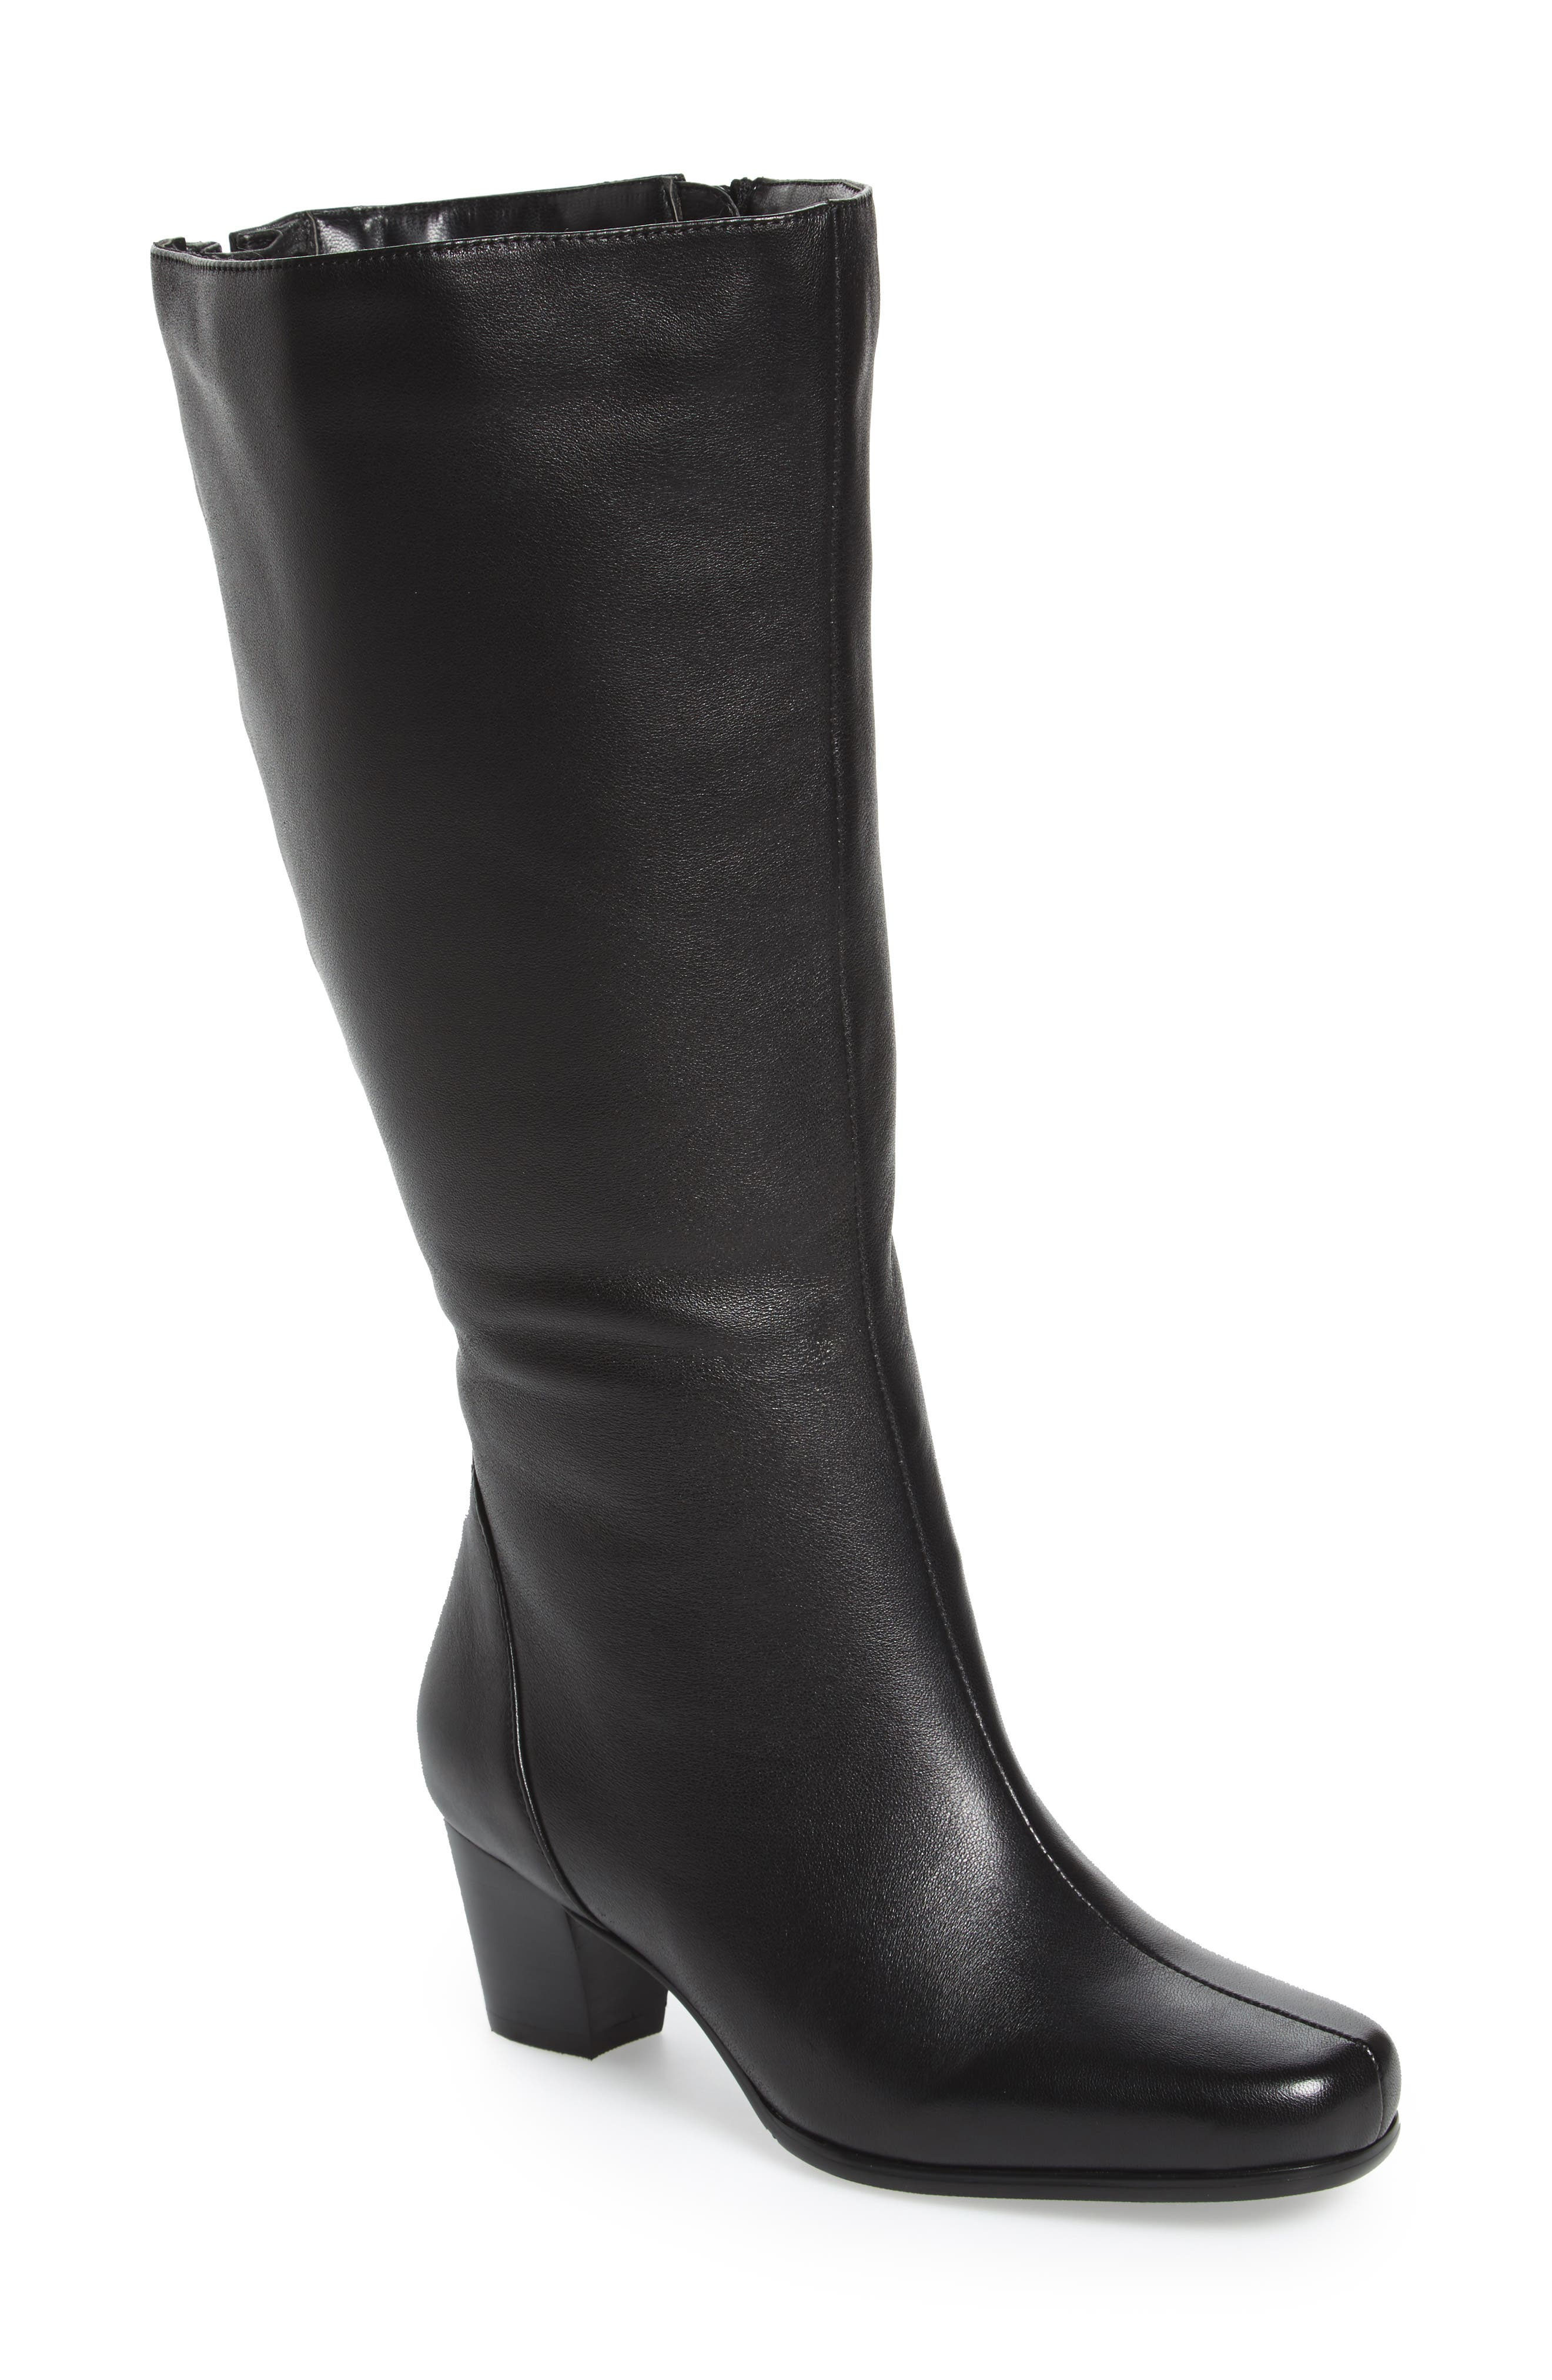 Tacoma 18 Tall Boot,                             Main thumbnail 1, color,                             BLACK LEATHER